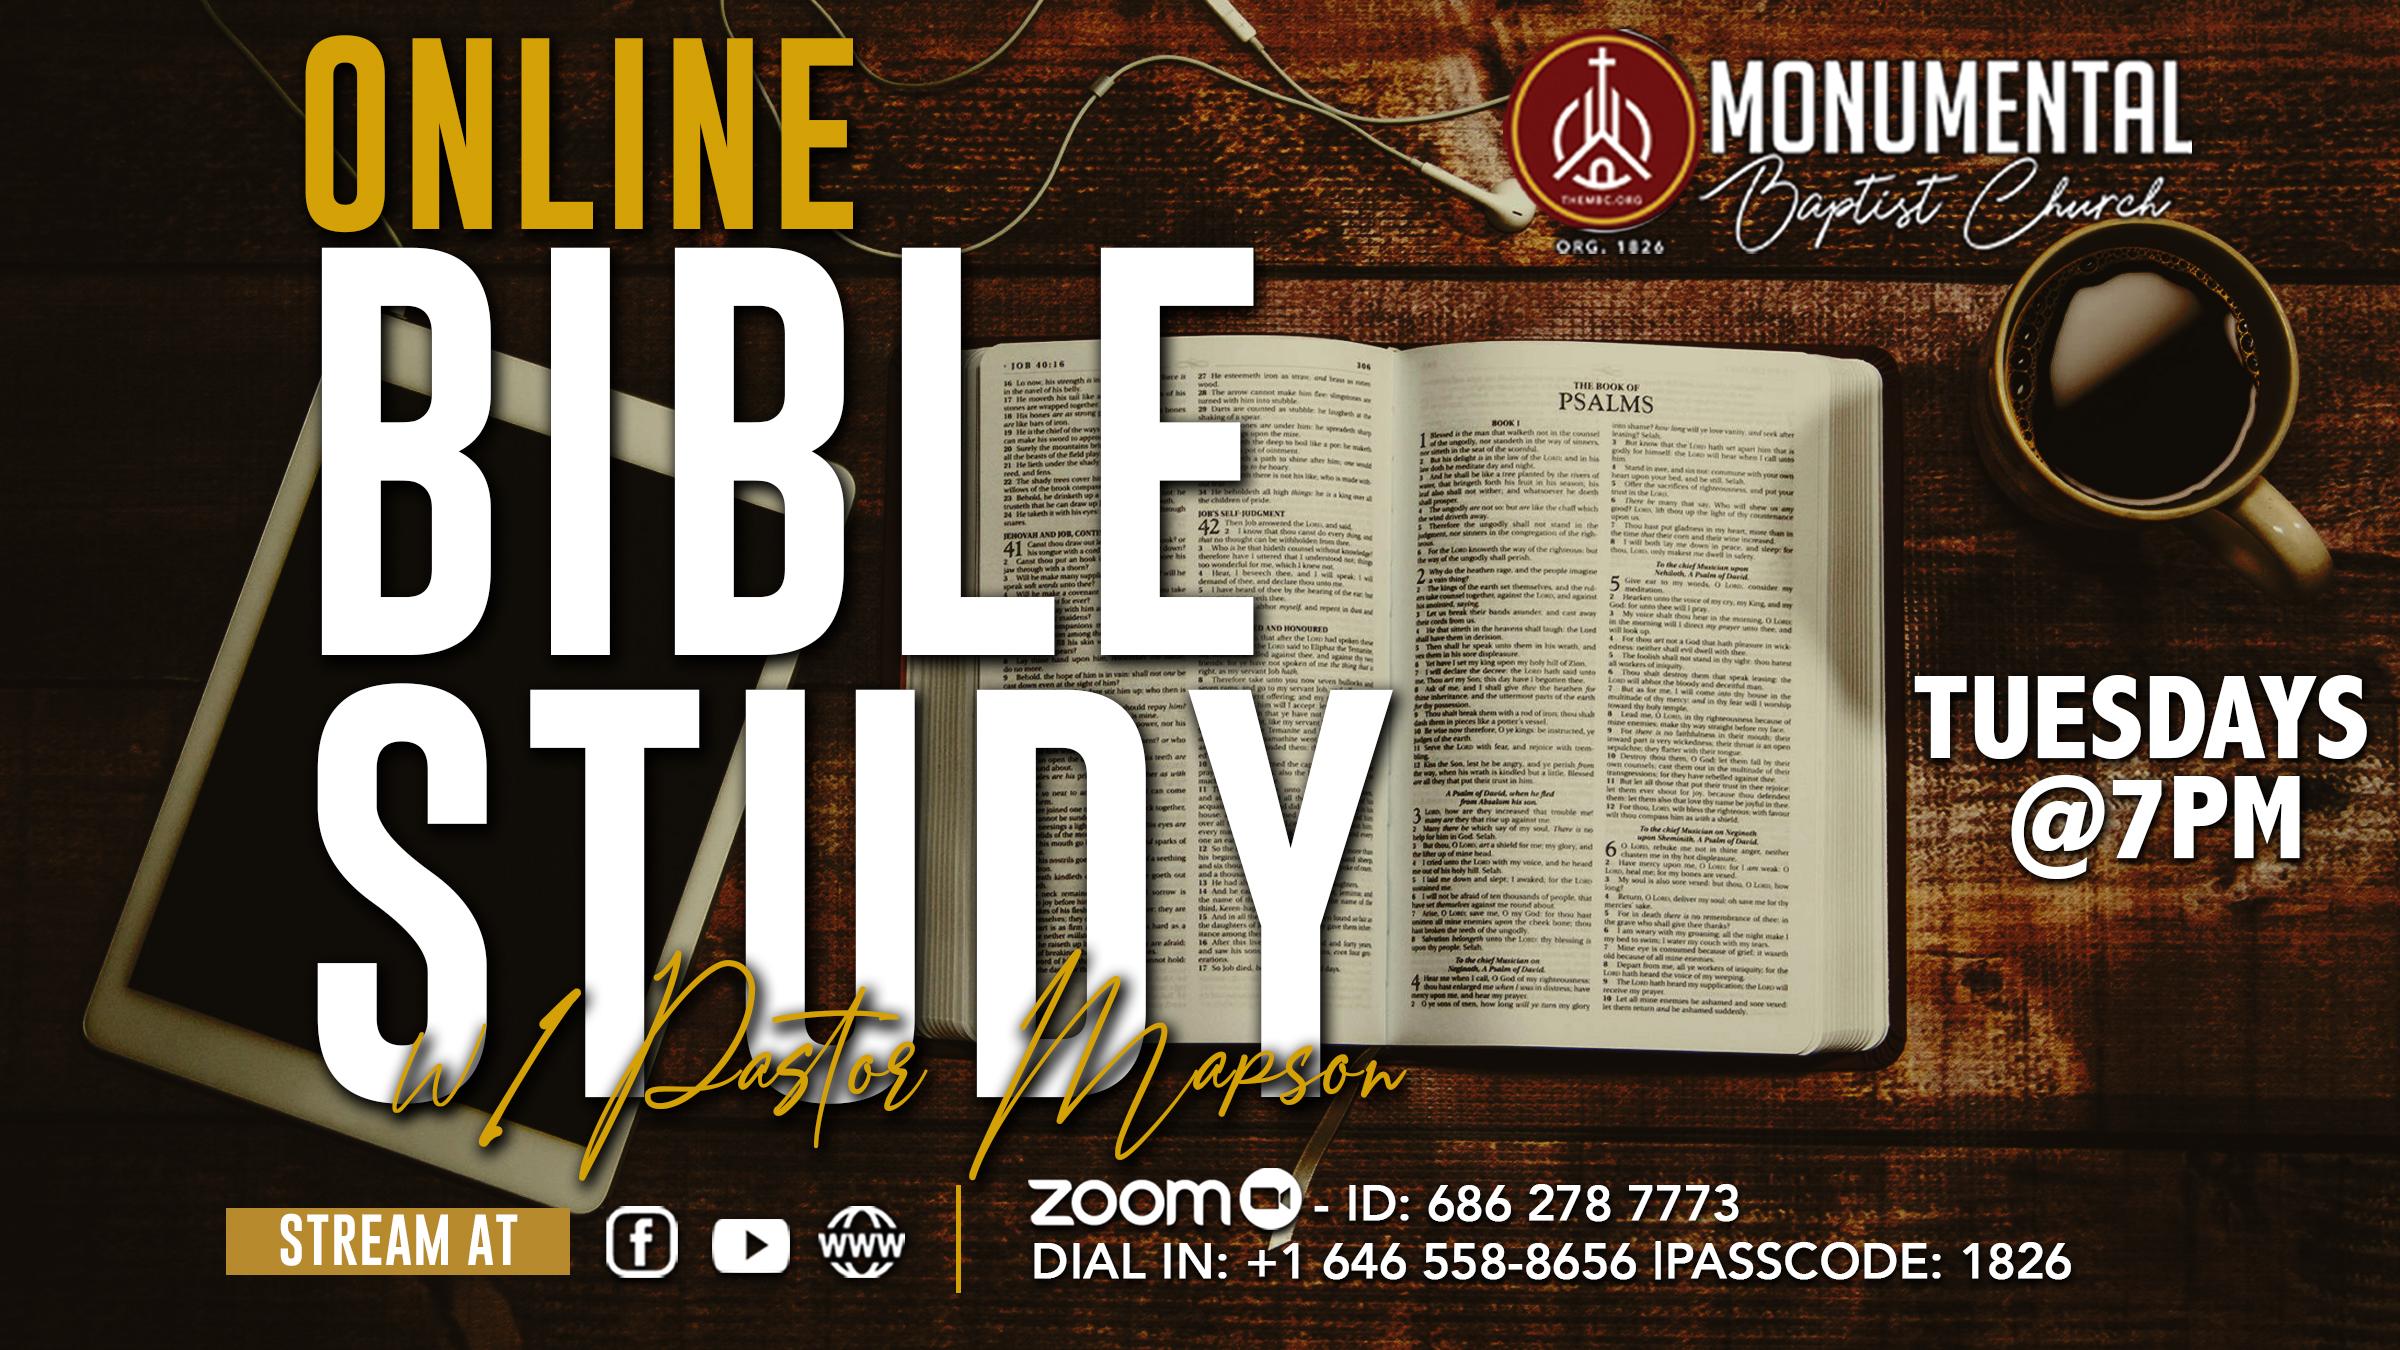 MBC Online Bible Study